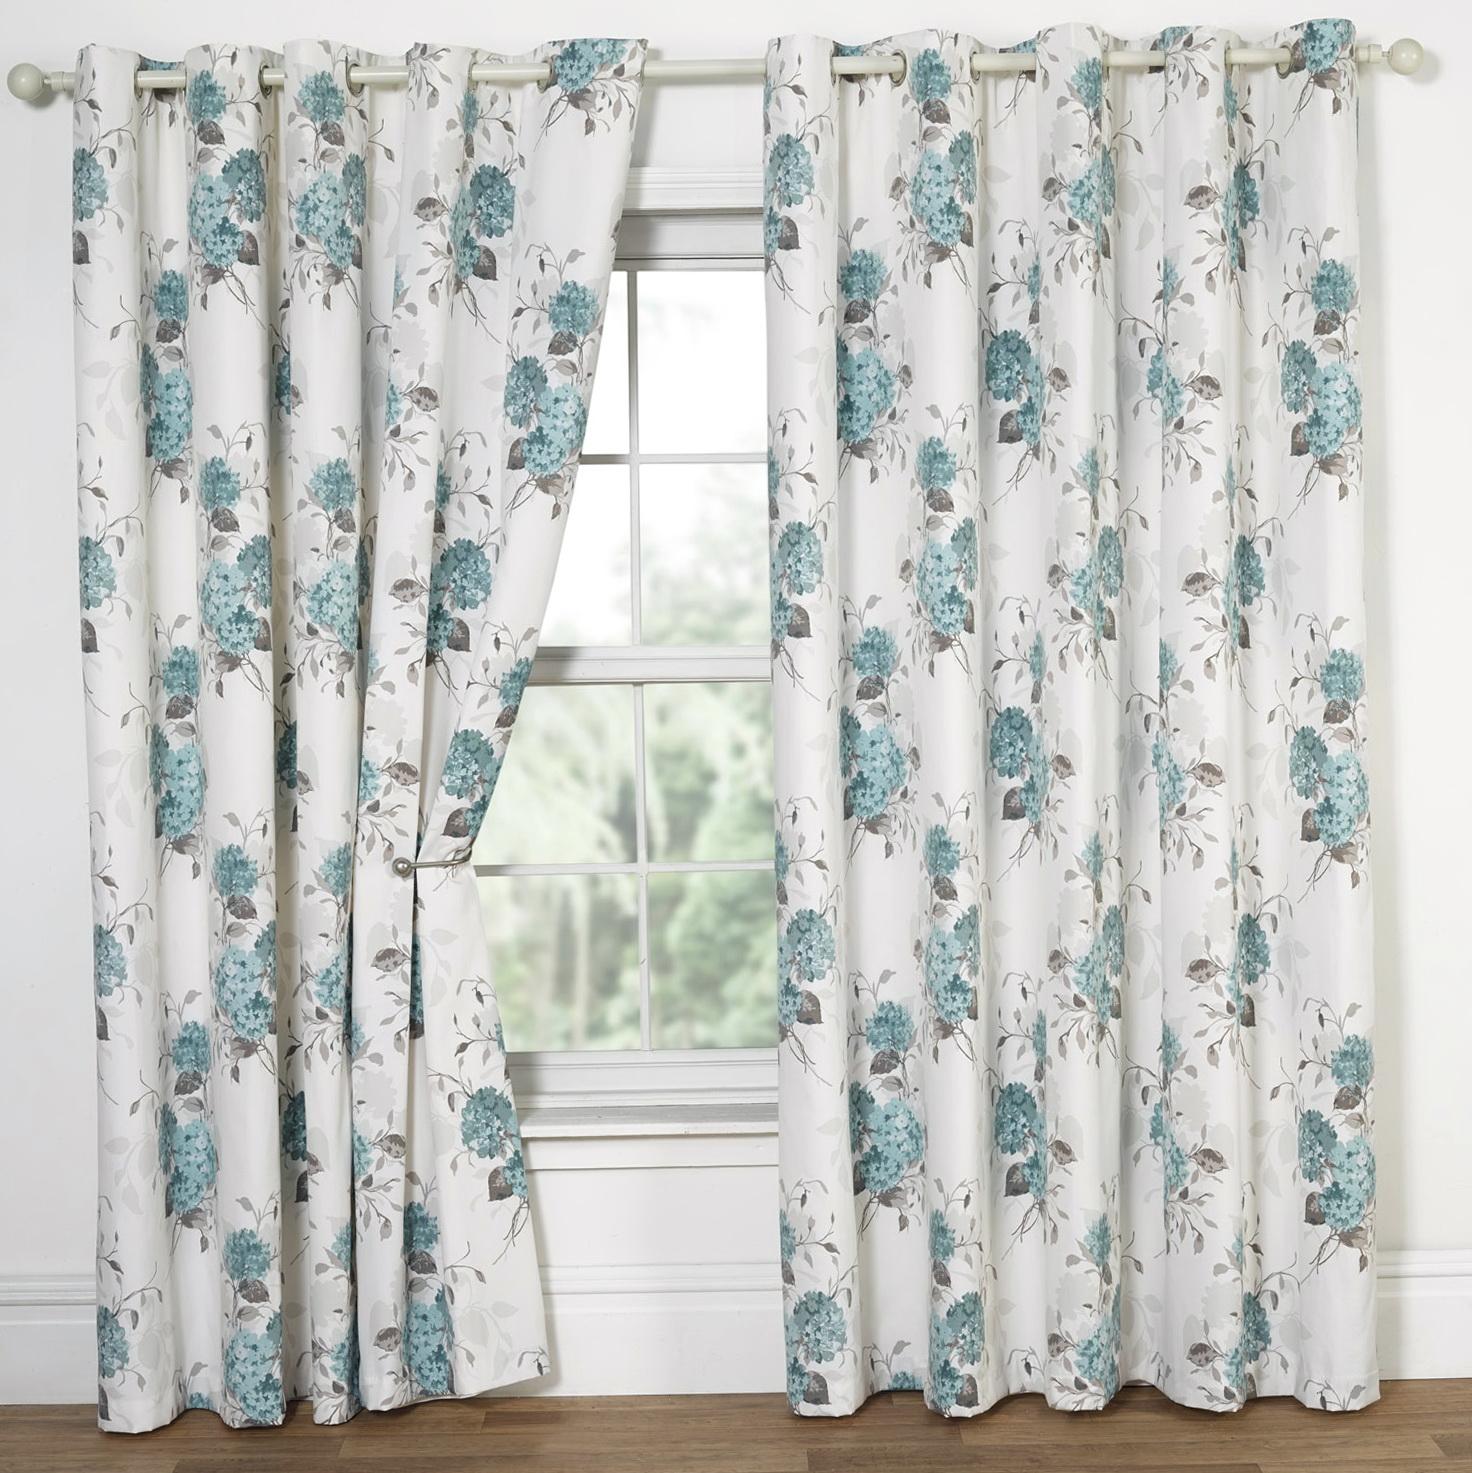 Blue Floral Curtains Uk | Home Design Ideas